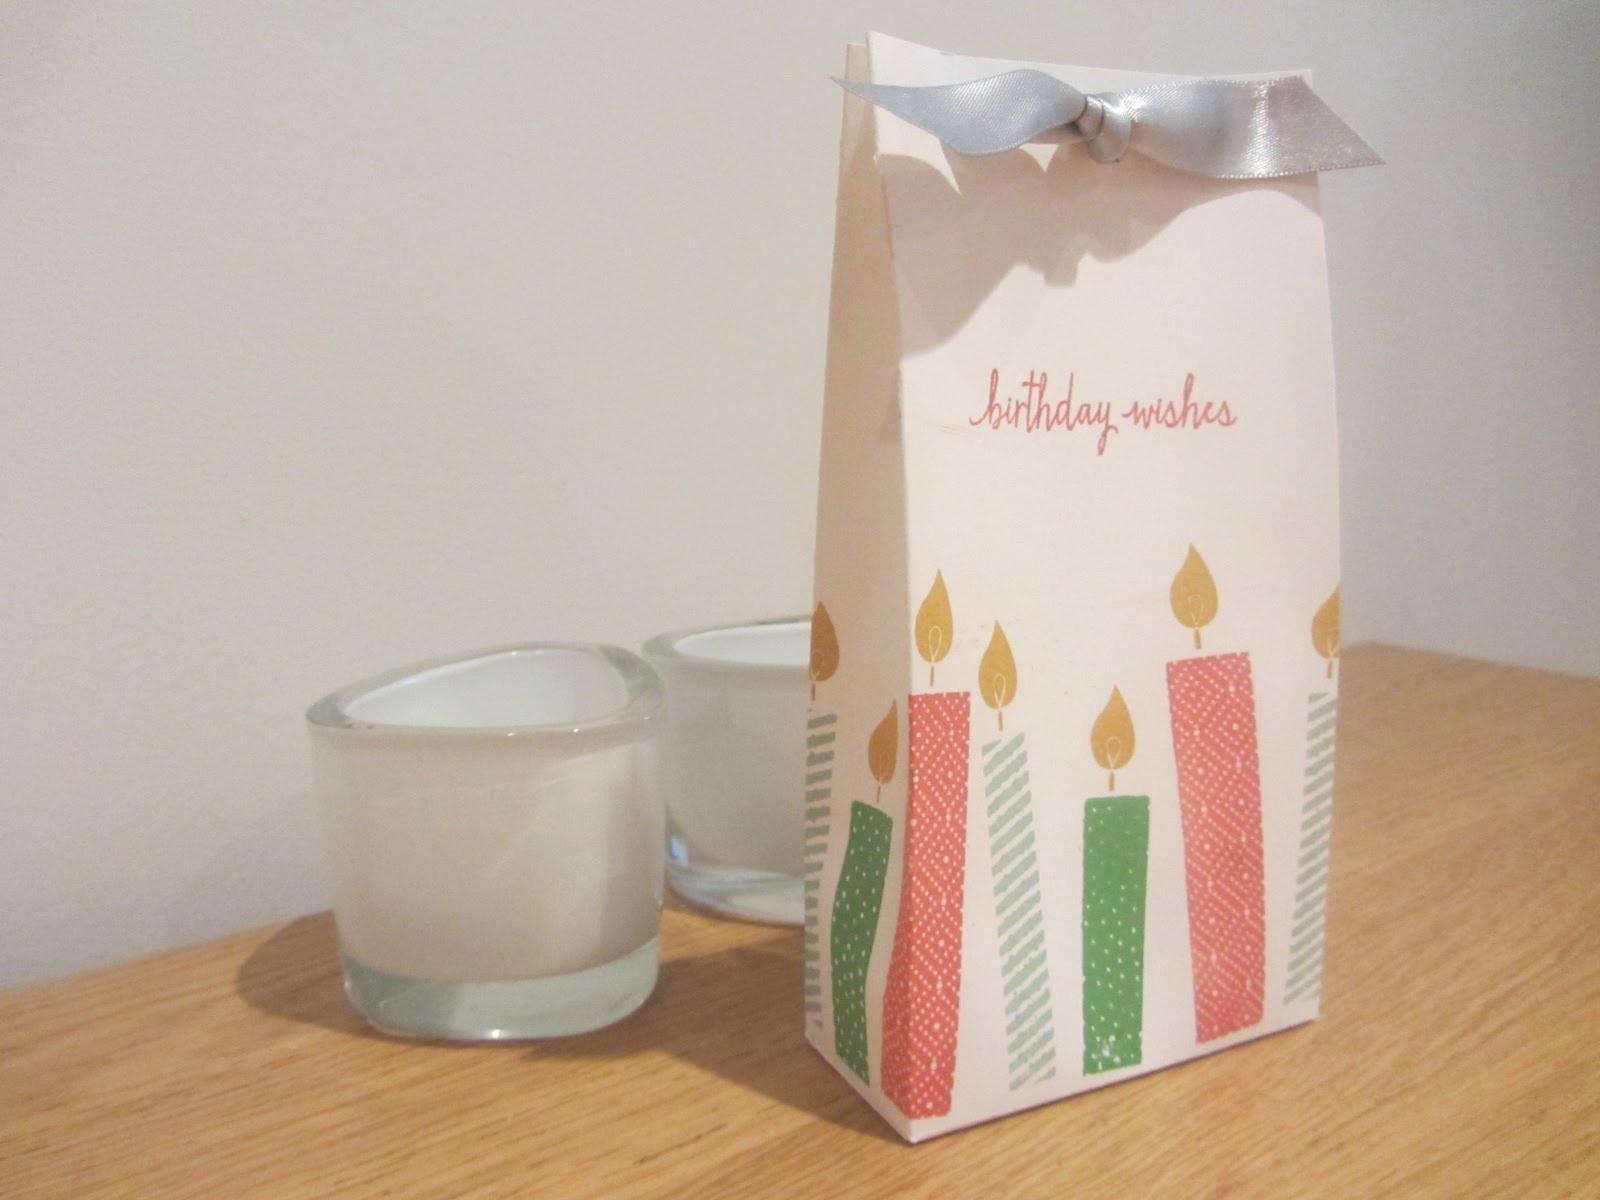 Build-a-Birthday Handmade Gift Bag Tutorial, Stampin' Up UK Sneak Peak